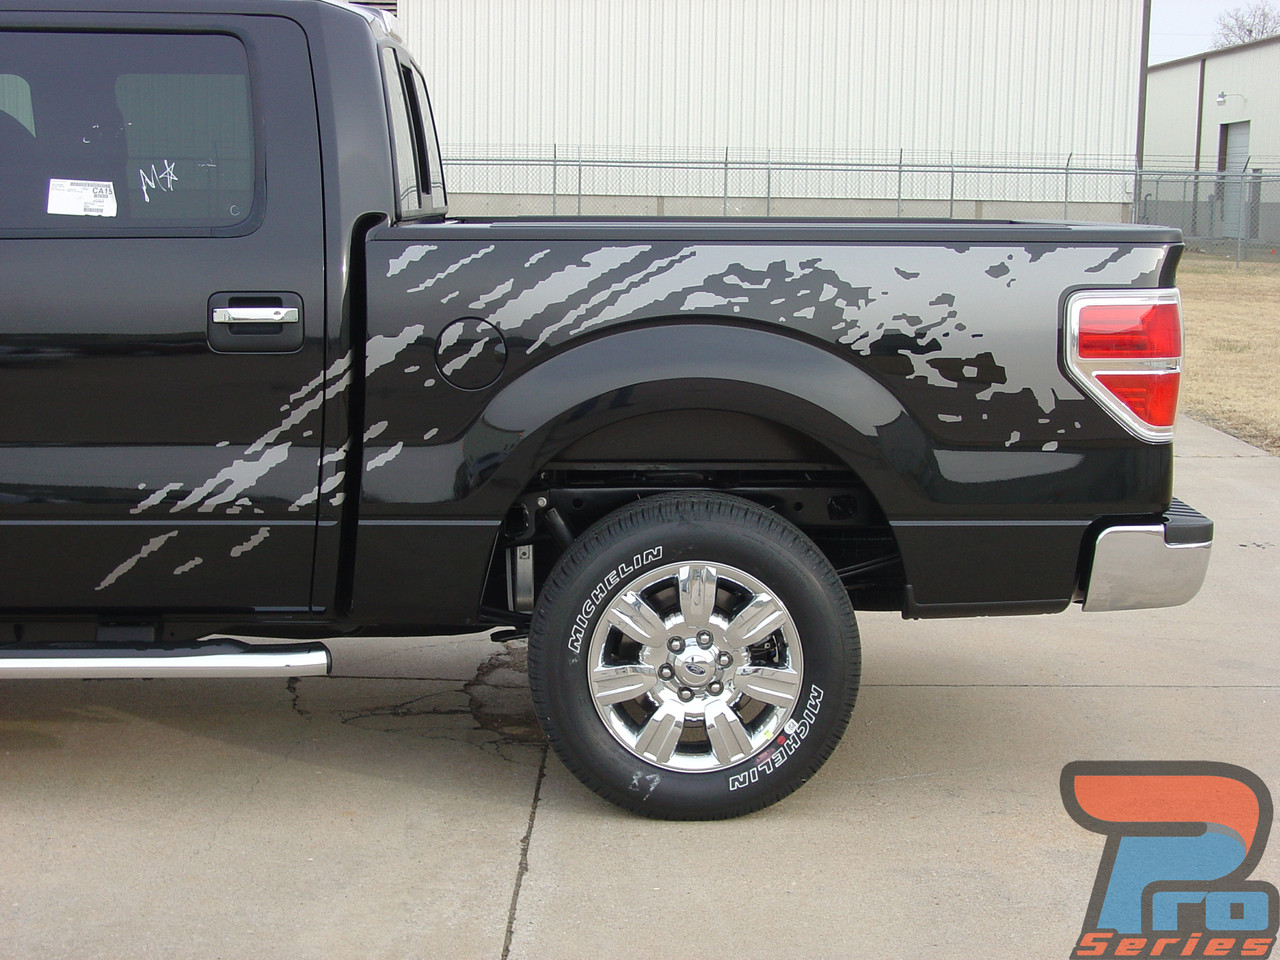 Predator 2009 2010 2011 2012 2013 2014 ford 150 f series raptor style mudslinger